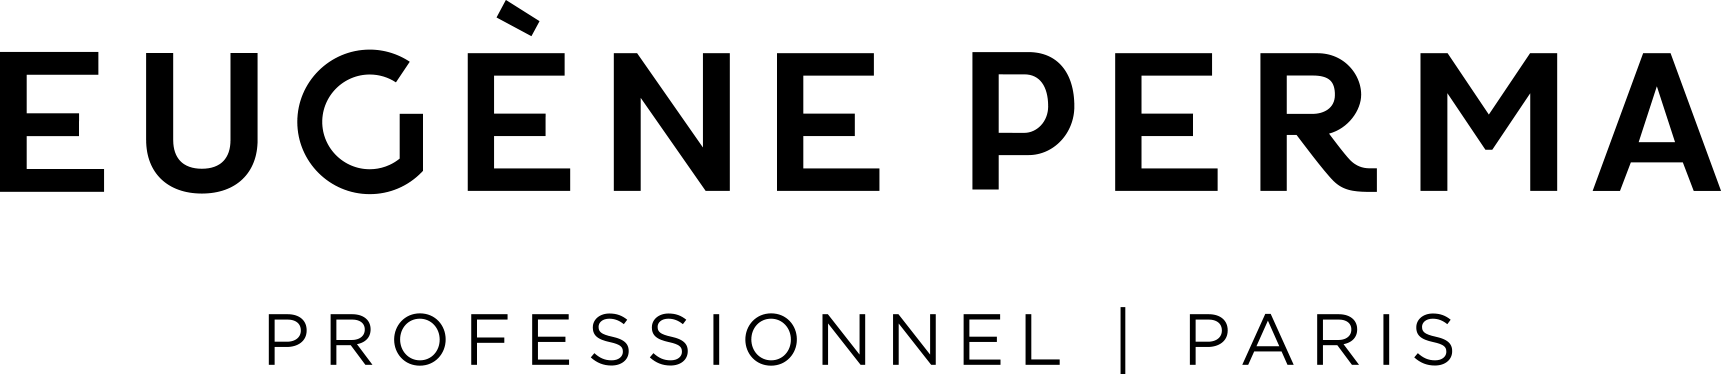 Eugene-Perma